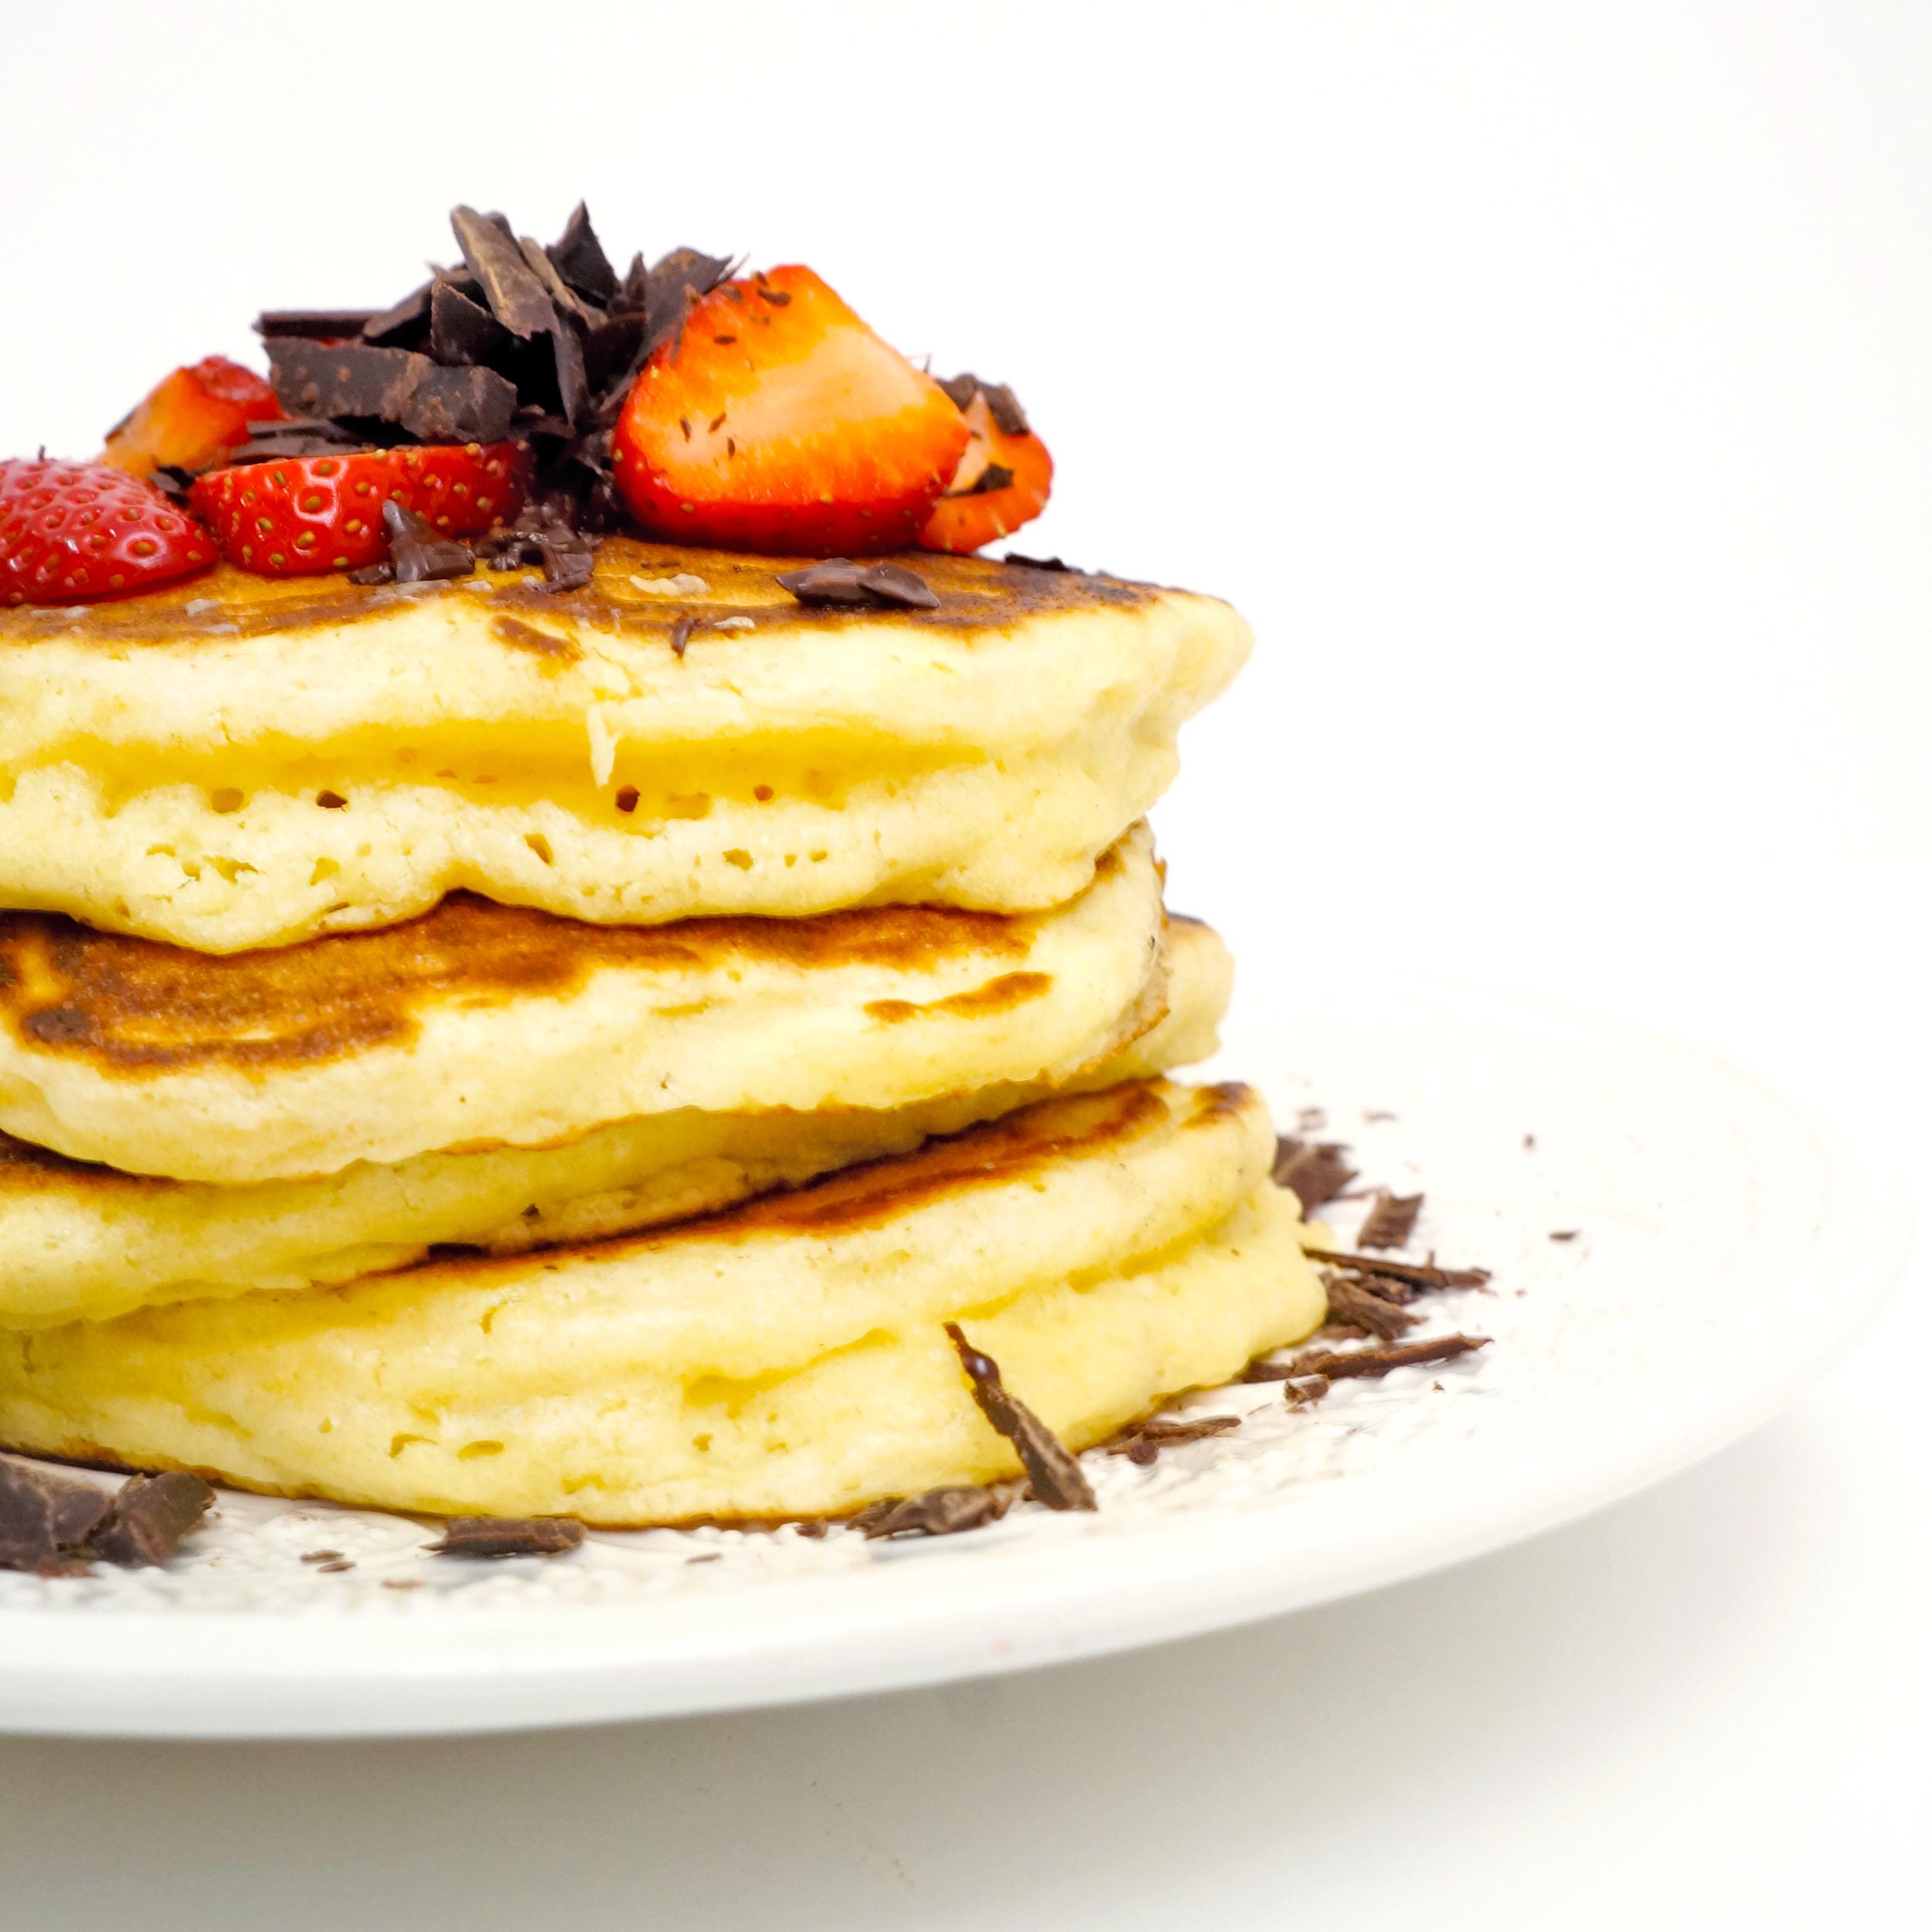 thegirlcaneat-clinton-st-pancakes-3